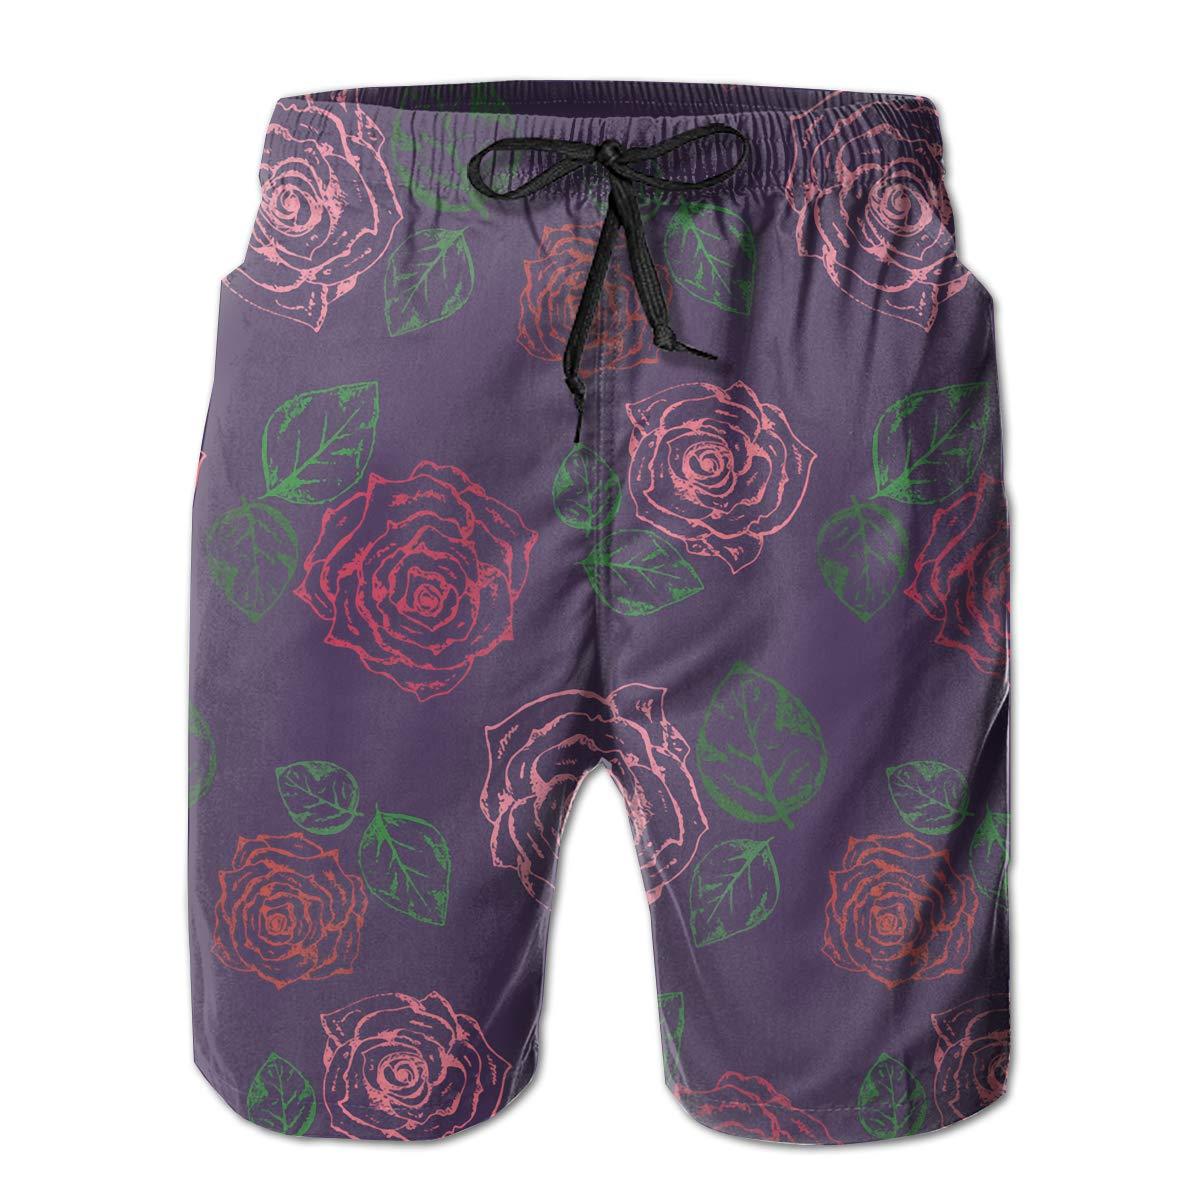 SARA NELL Mens Swim Trunks Dark-Purple-Pattern-with-Scratched-Pink-Roses Surfing Beach Board Shorts Swimwear